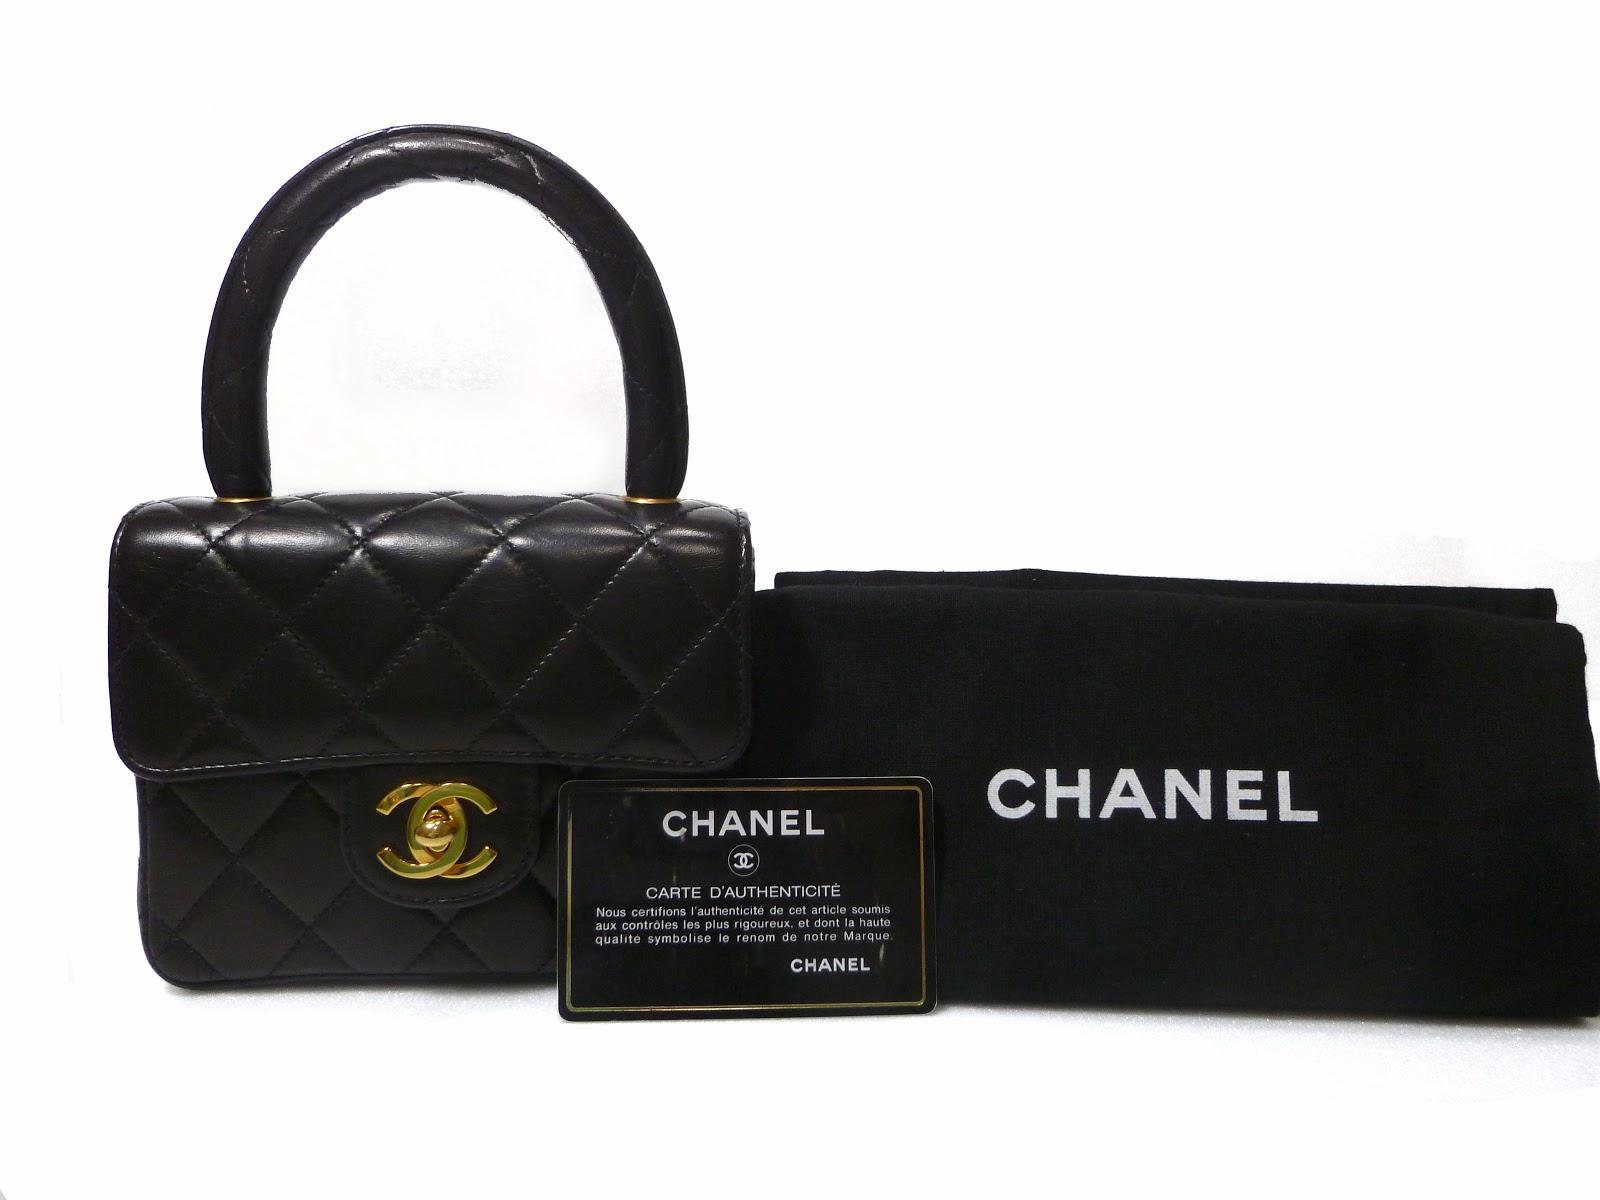 Chanel Mini Kelly Tote Bag